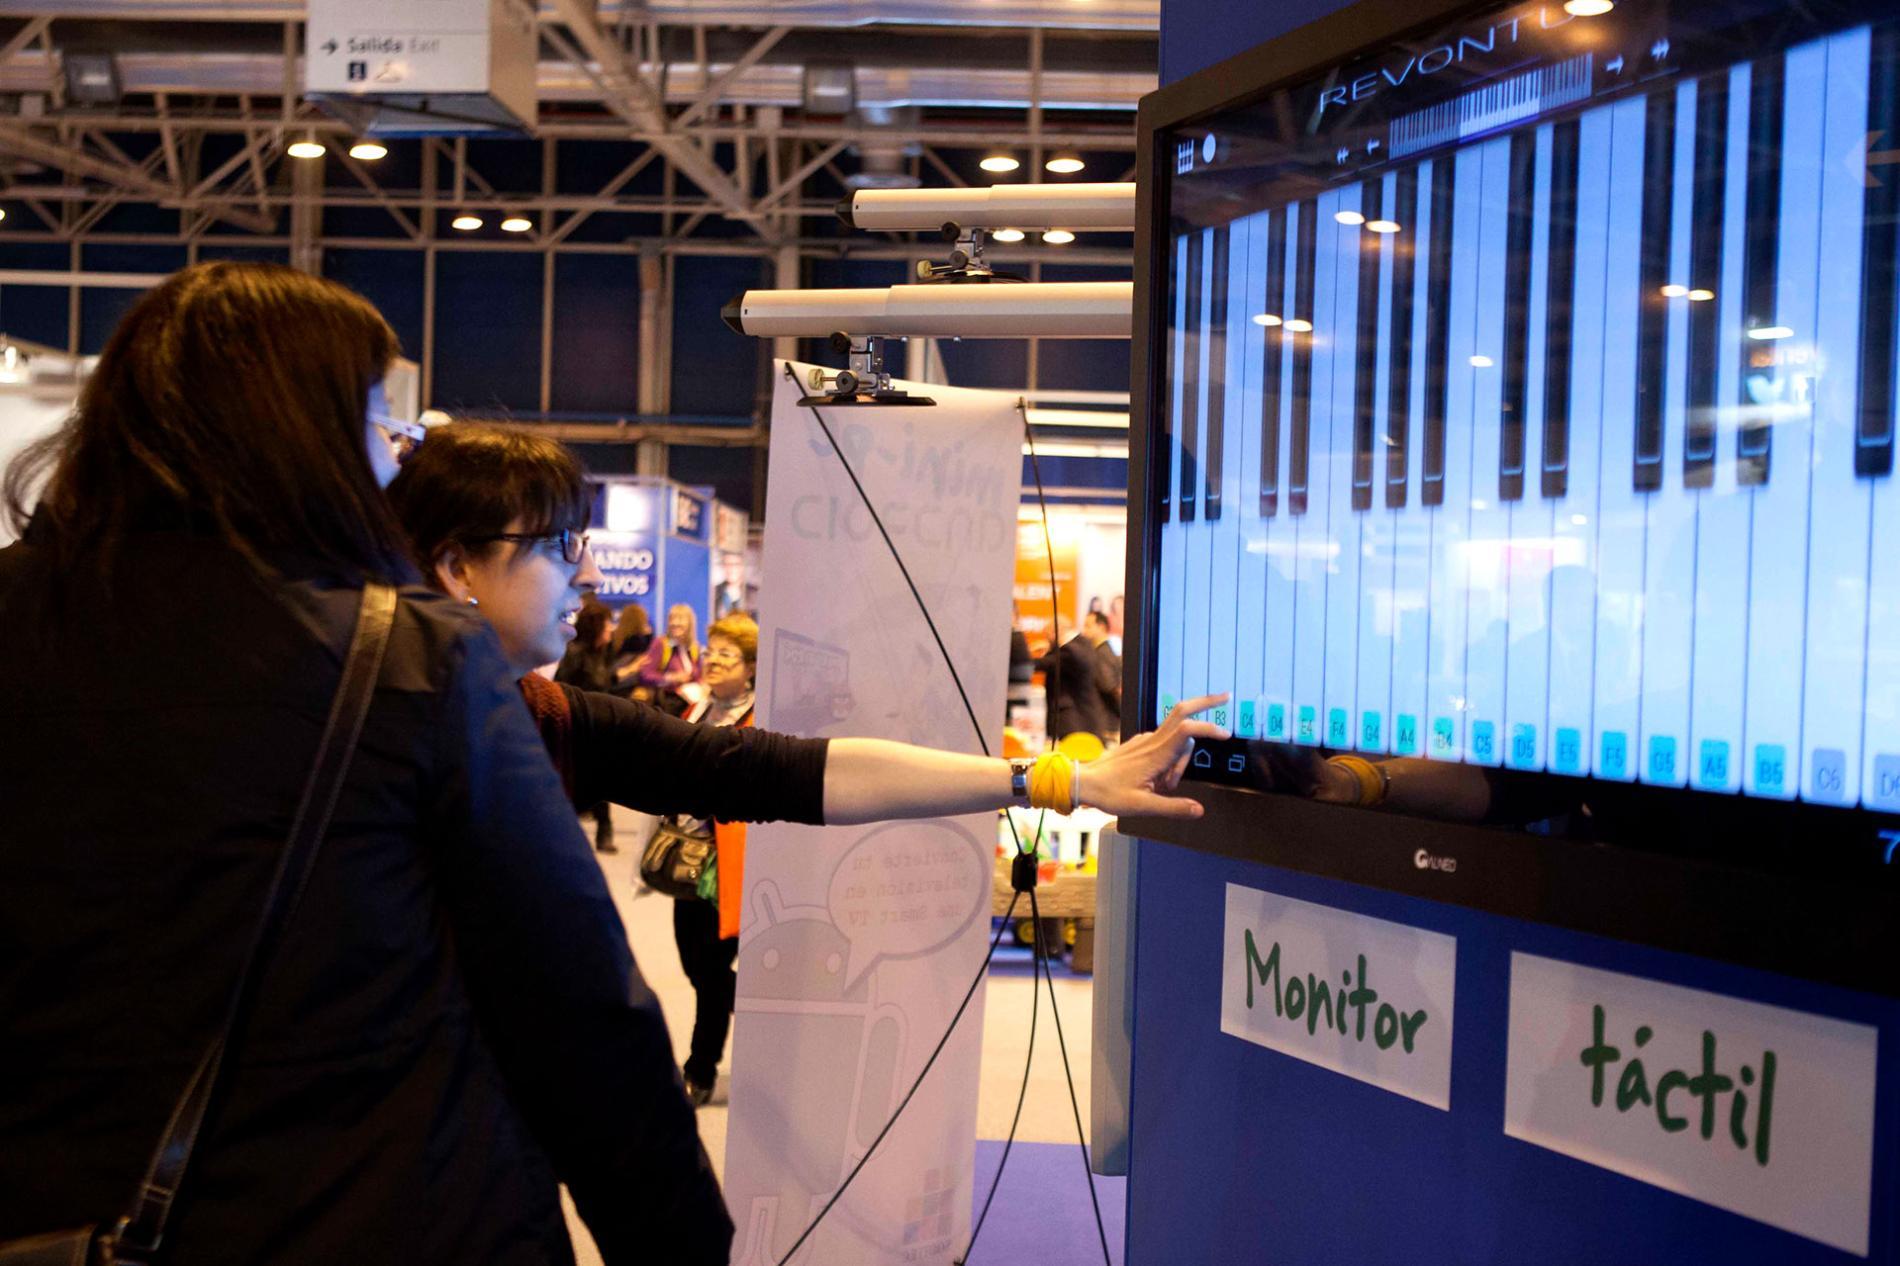 Visitantes probando un monitor tactil